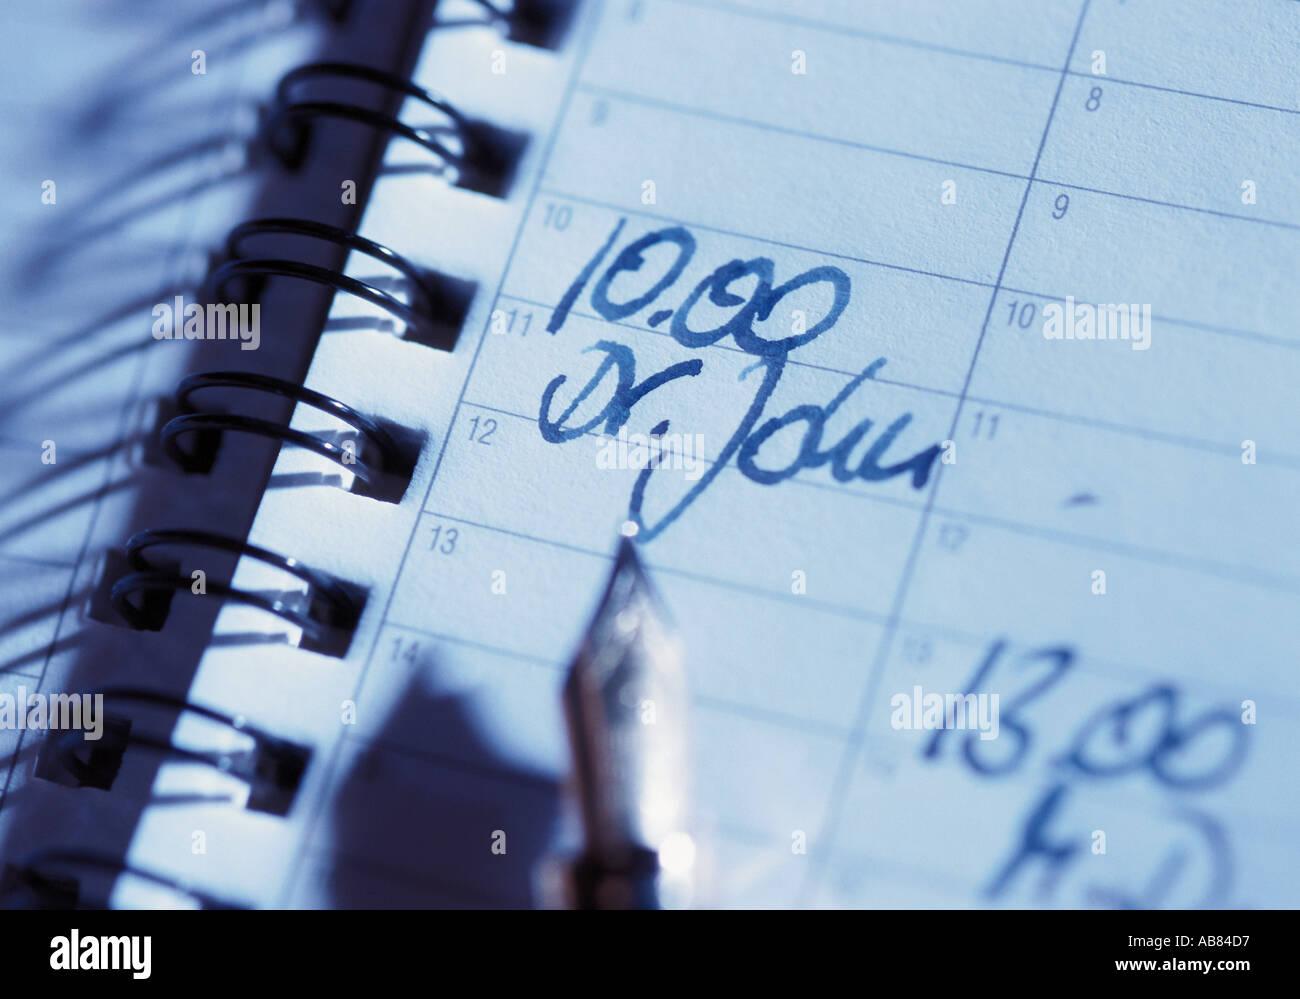 Tagebuch-Eintrag Stockbild